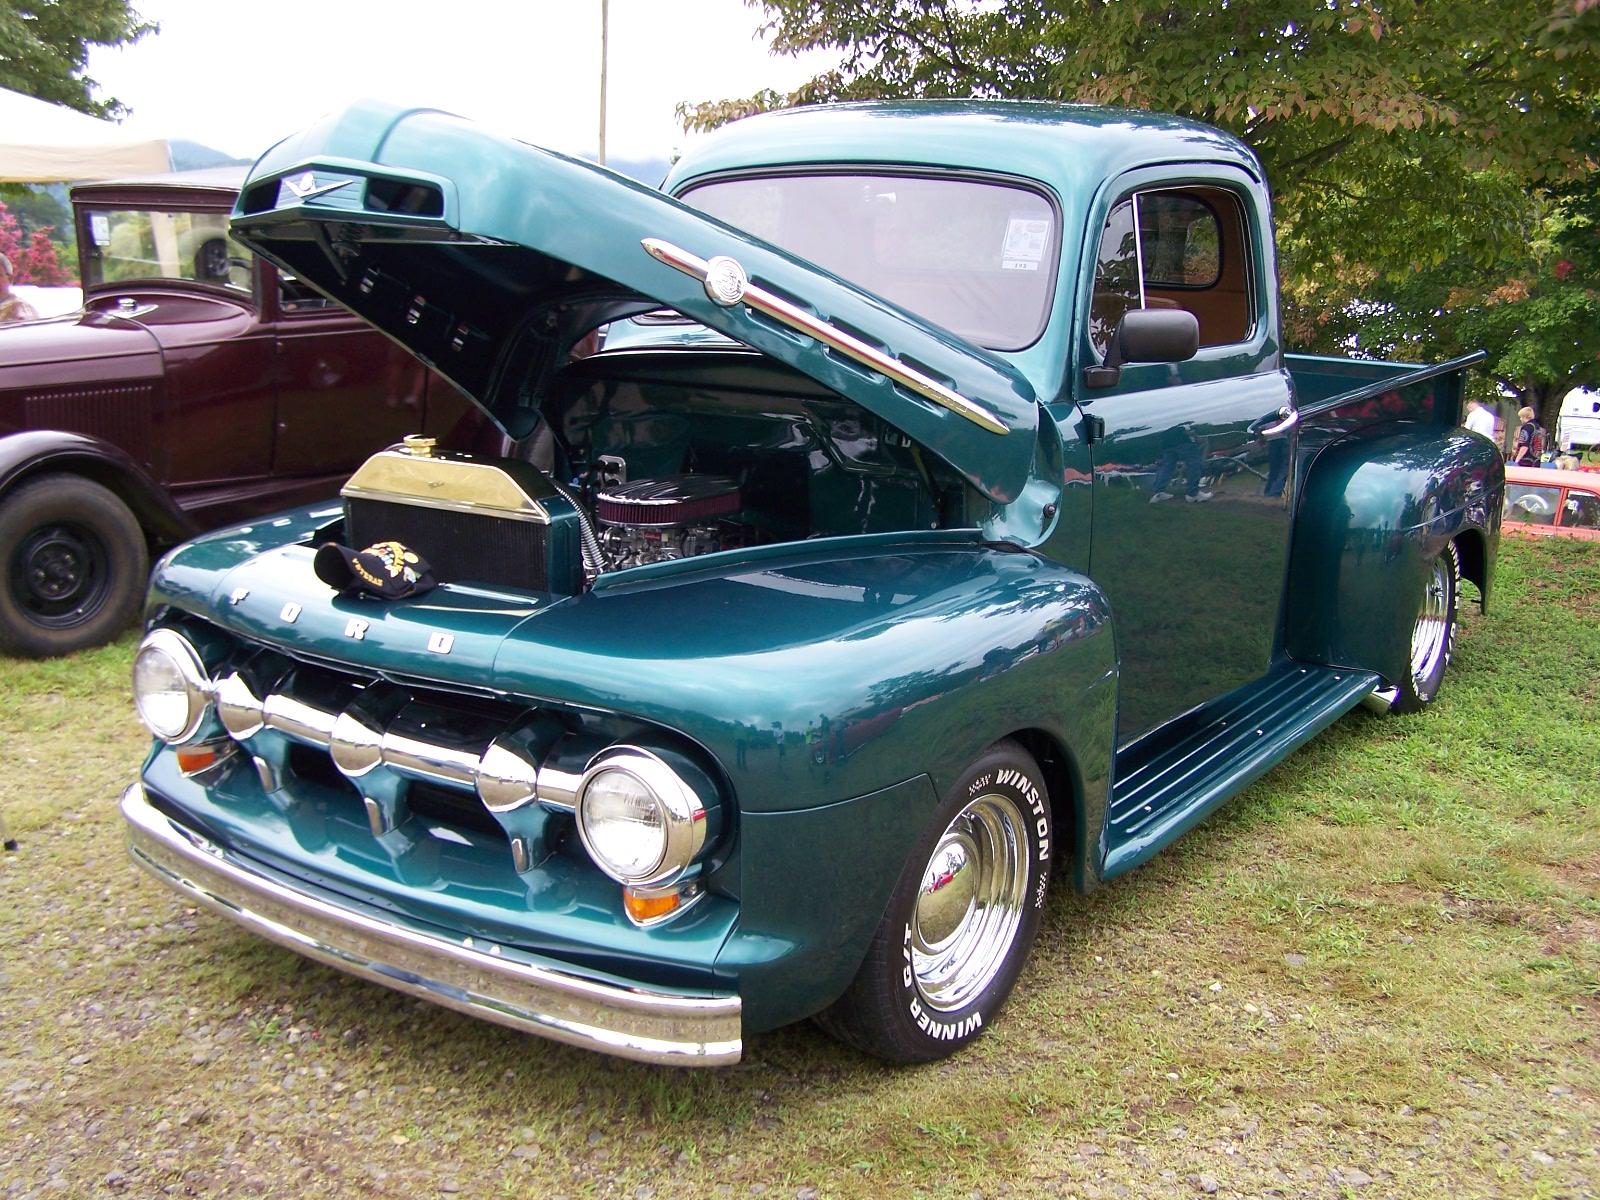 1950 ford f100 for sale craigslist - Filename 7783147230_6d45ea4c0e_h Jpg